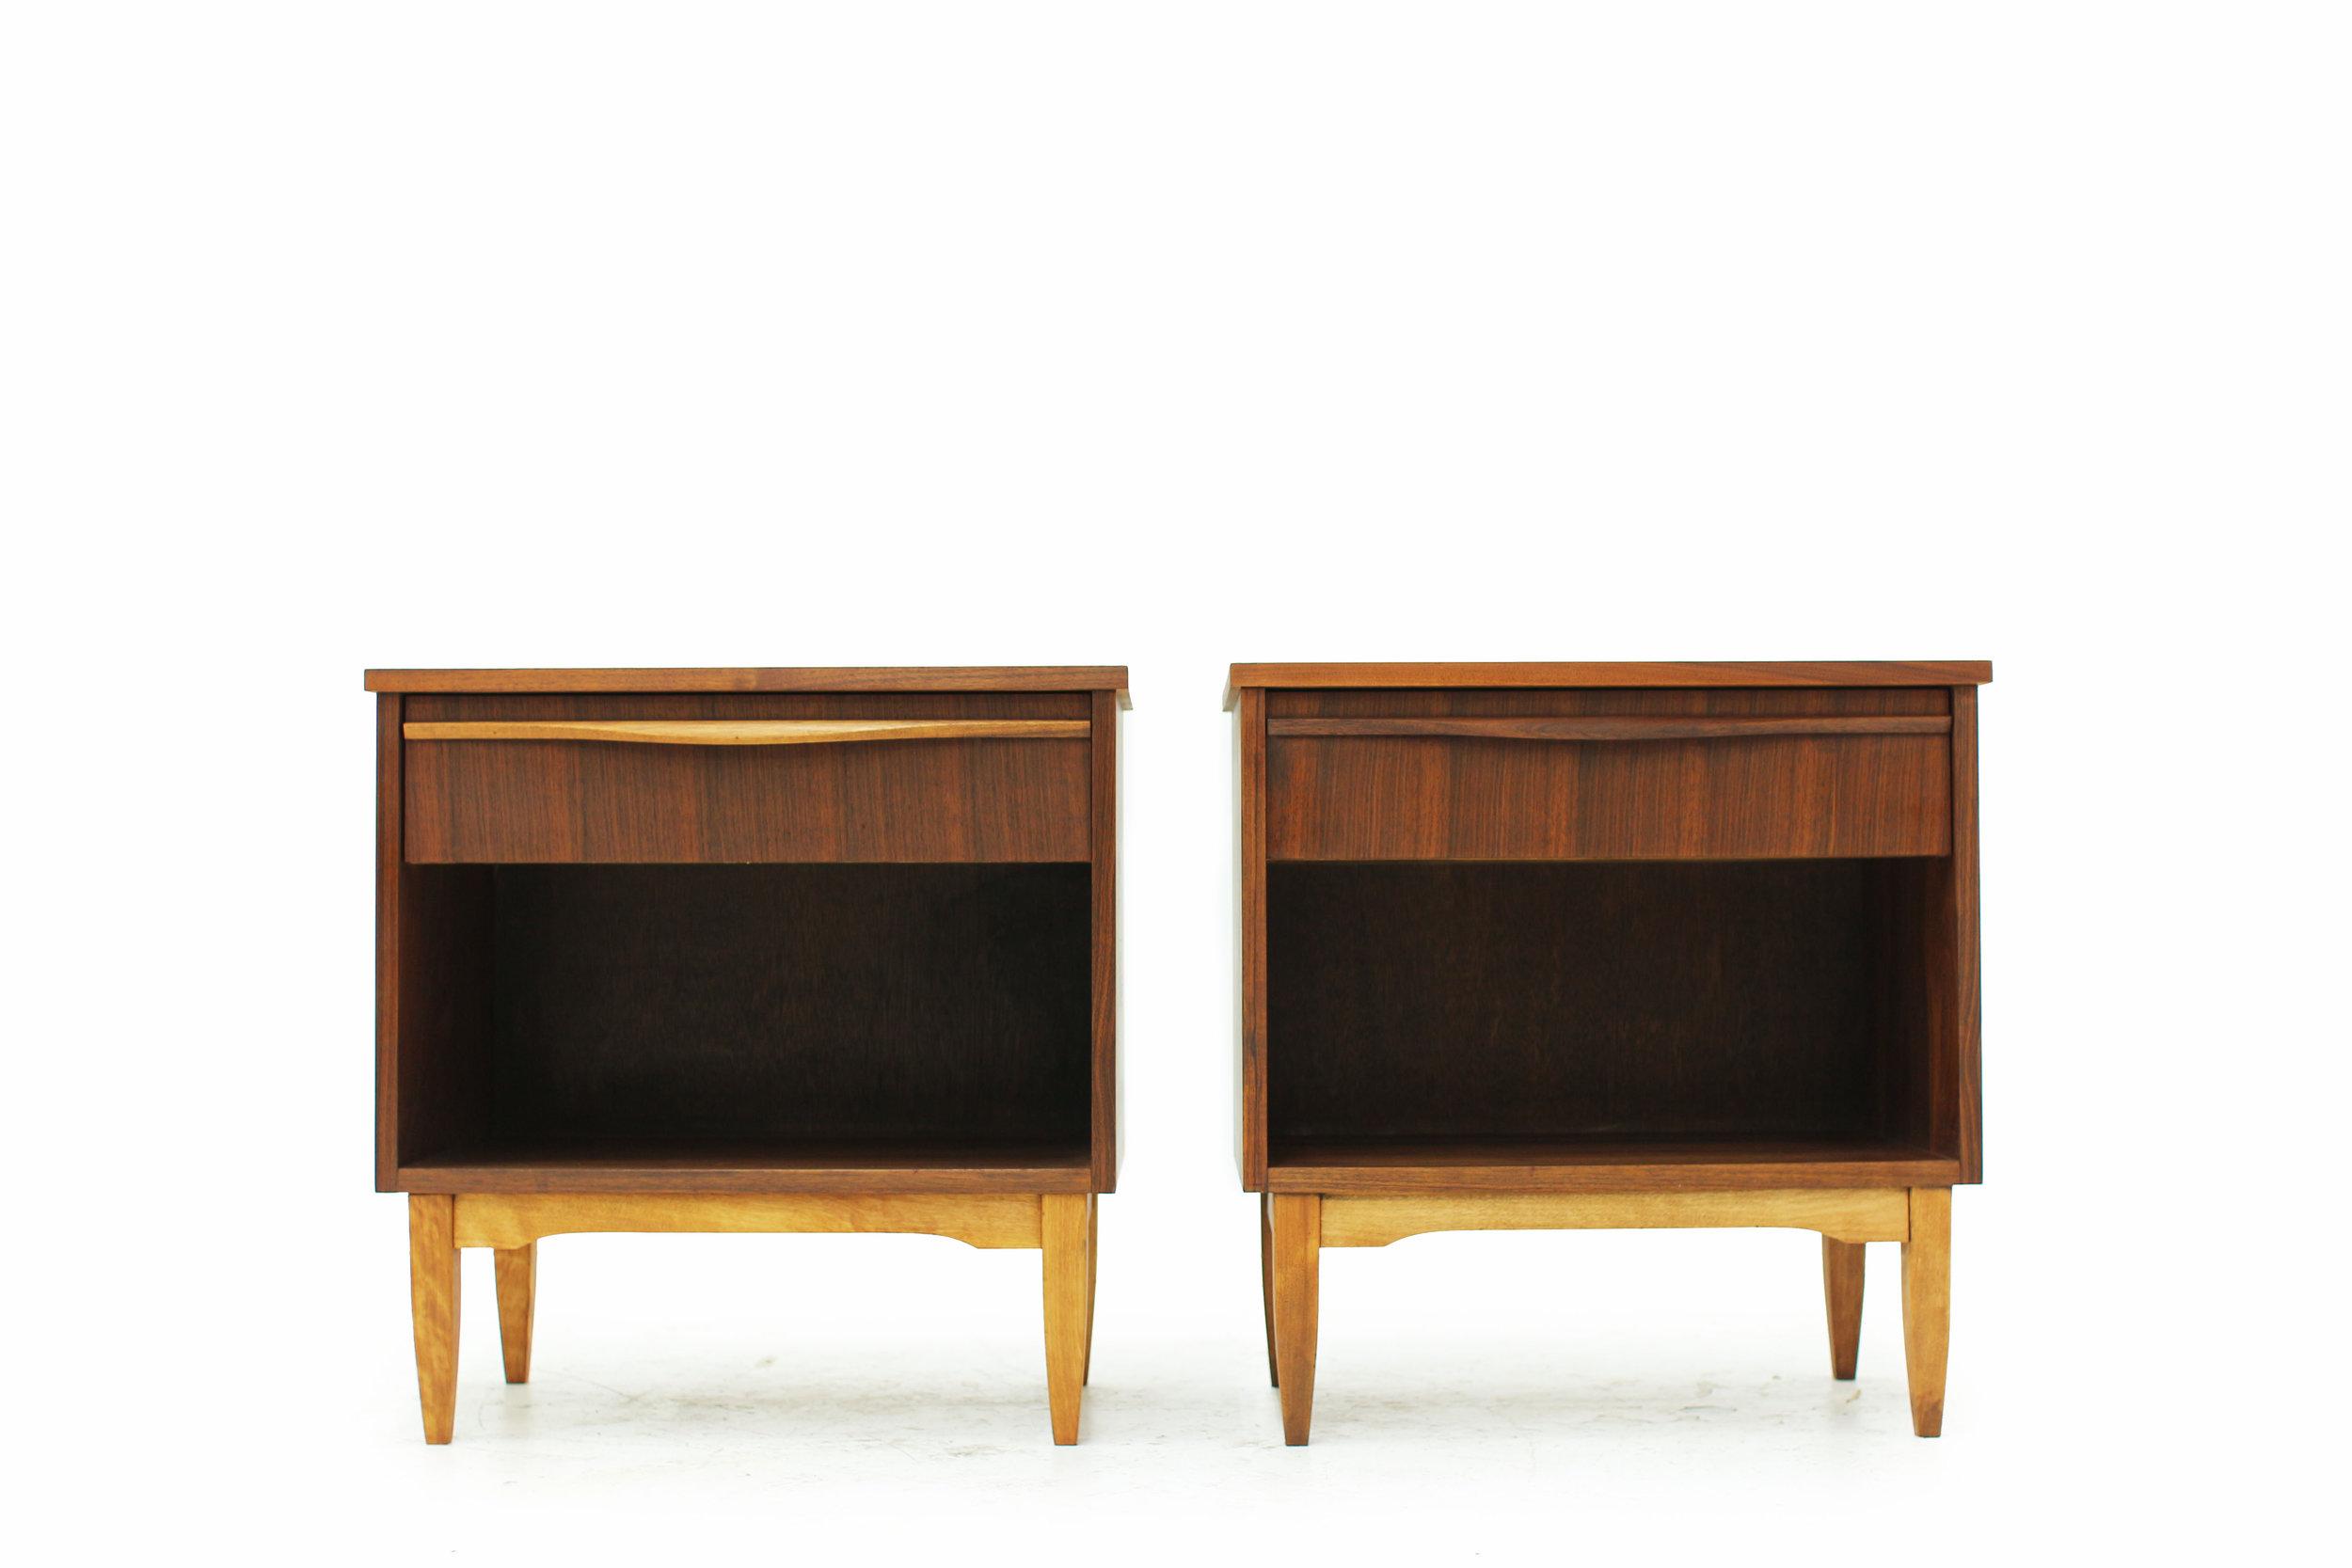 Pair of Mid Century Kaufman Nightstands in Walnut (2).jpg